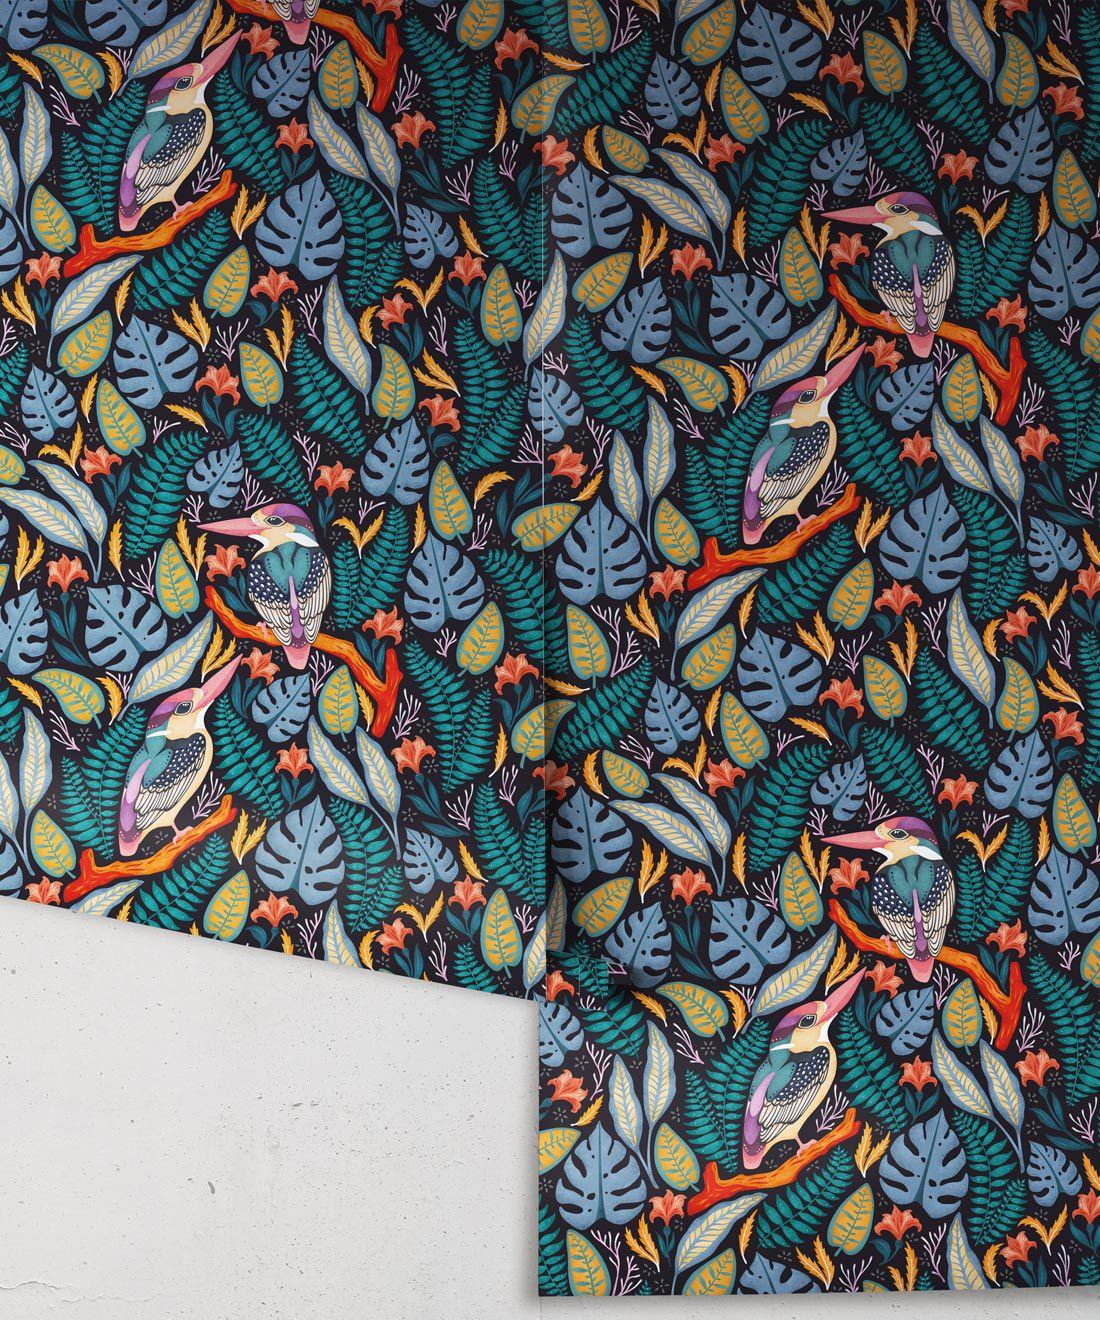 Kingfisher Wallpaper • Bird Wallpaper • Assorted Color Wallpaper Rolls